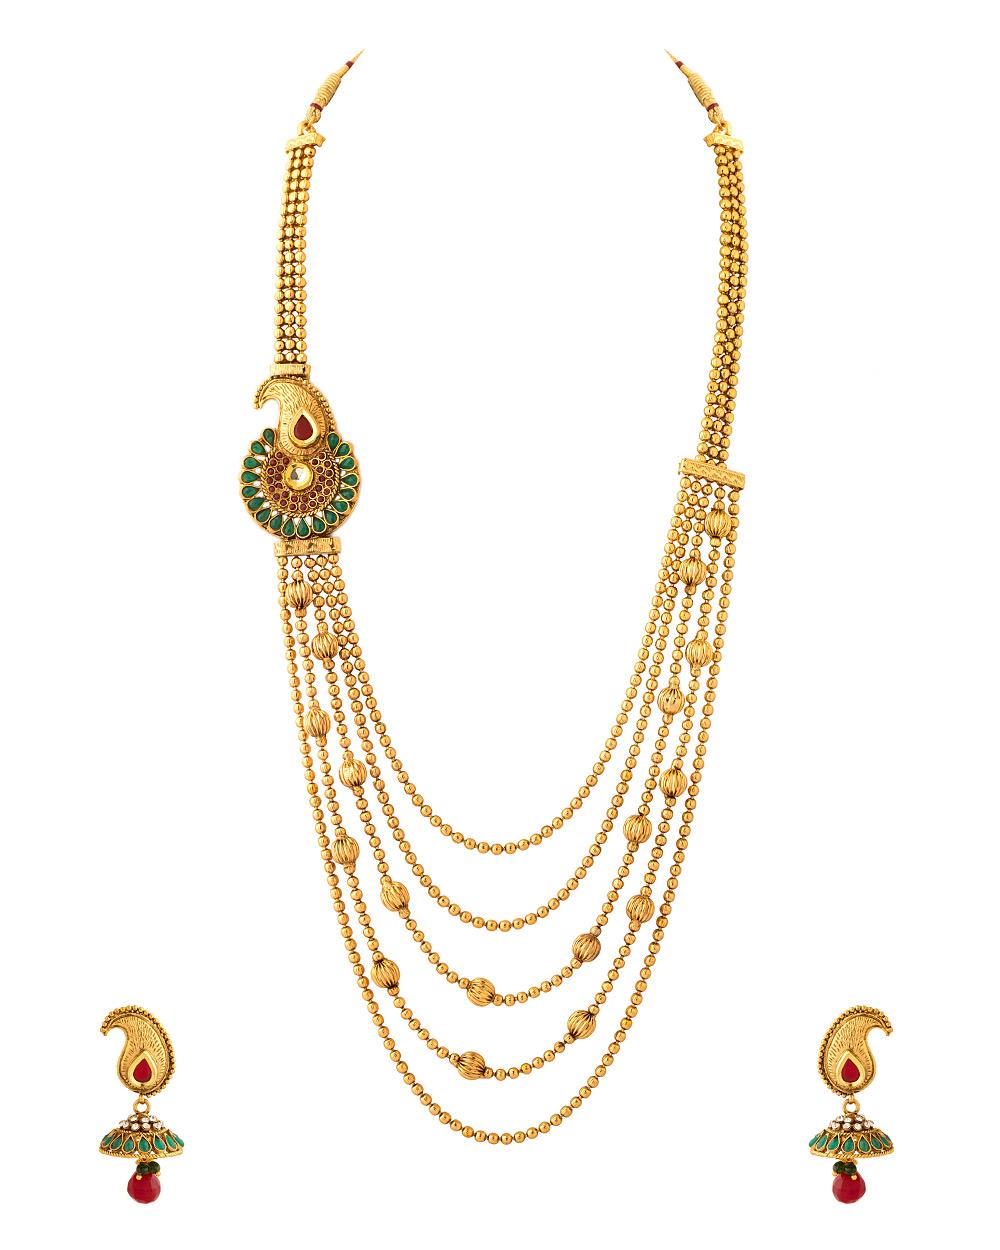 Buy Rani Haar With Traditional Work Online India | Voylla